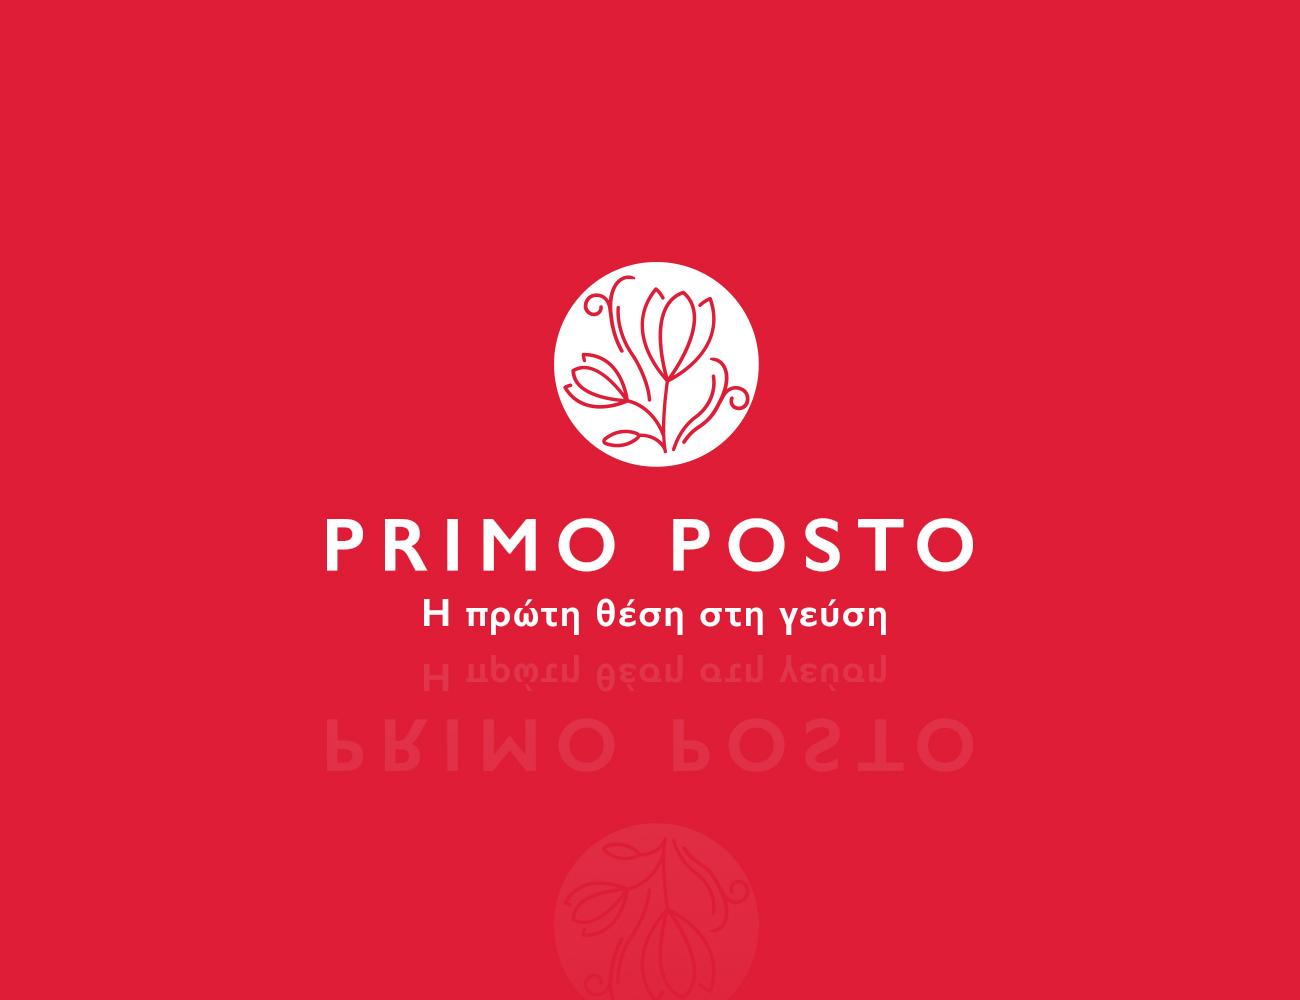 primopostologodesign2